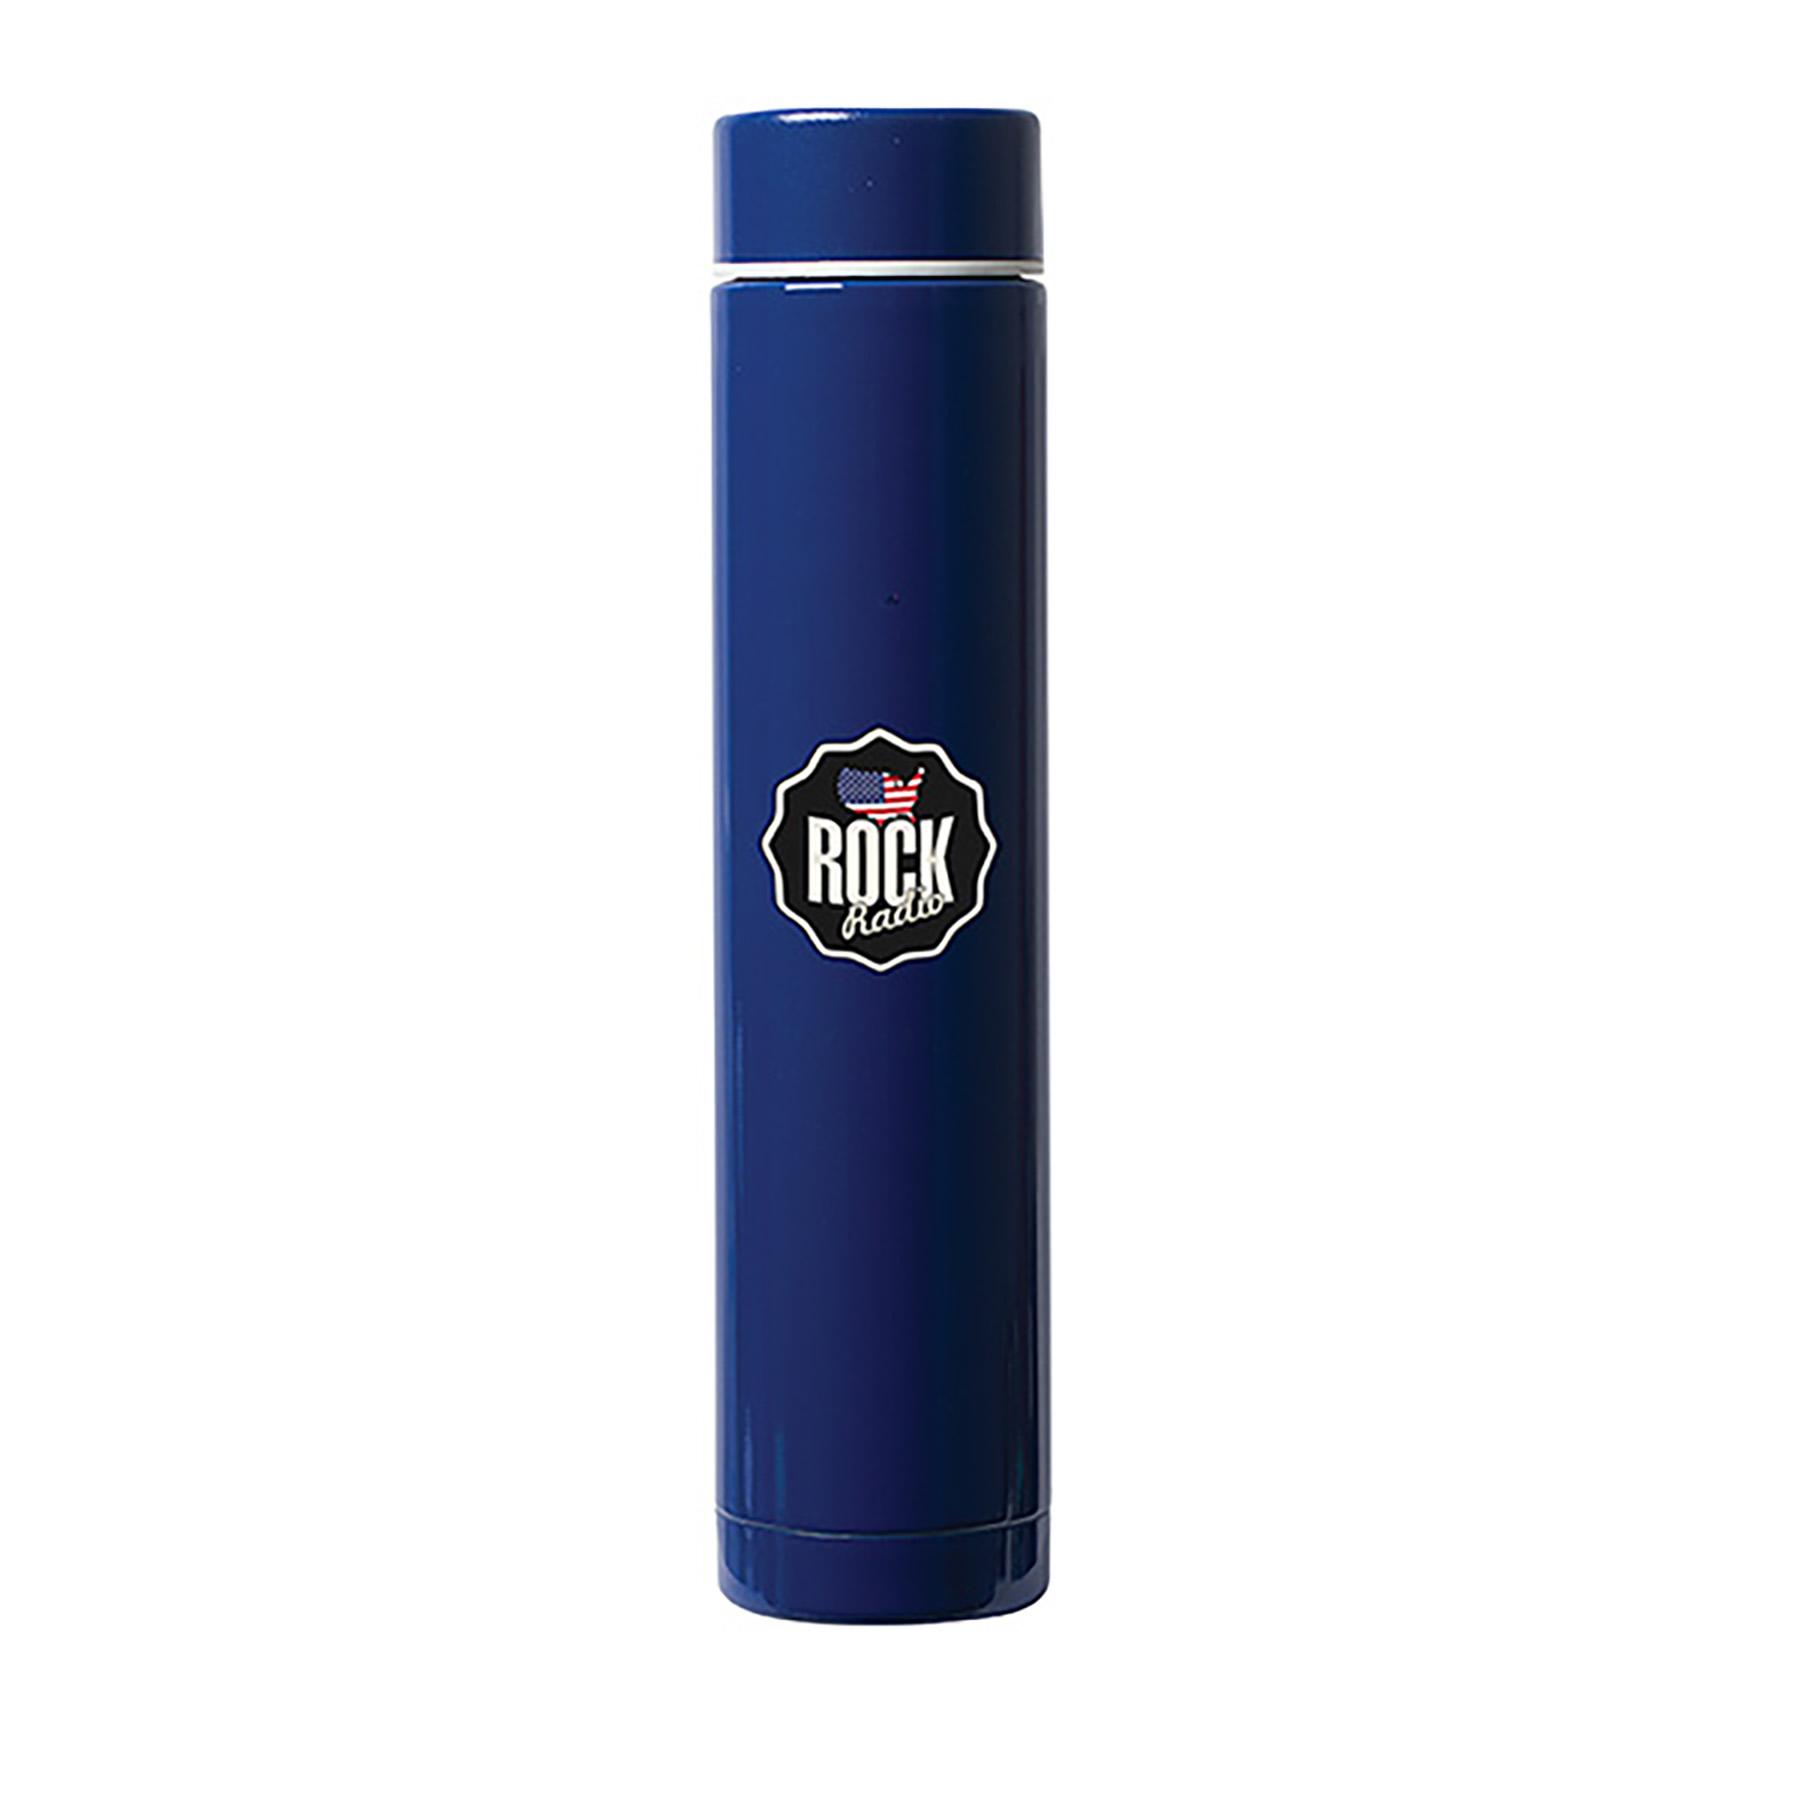 Skyrize 250 Ml. (8 Oz.) Mini Slim Bottle, WB9508, 1 Colour Imprint